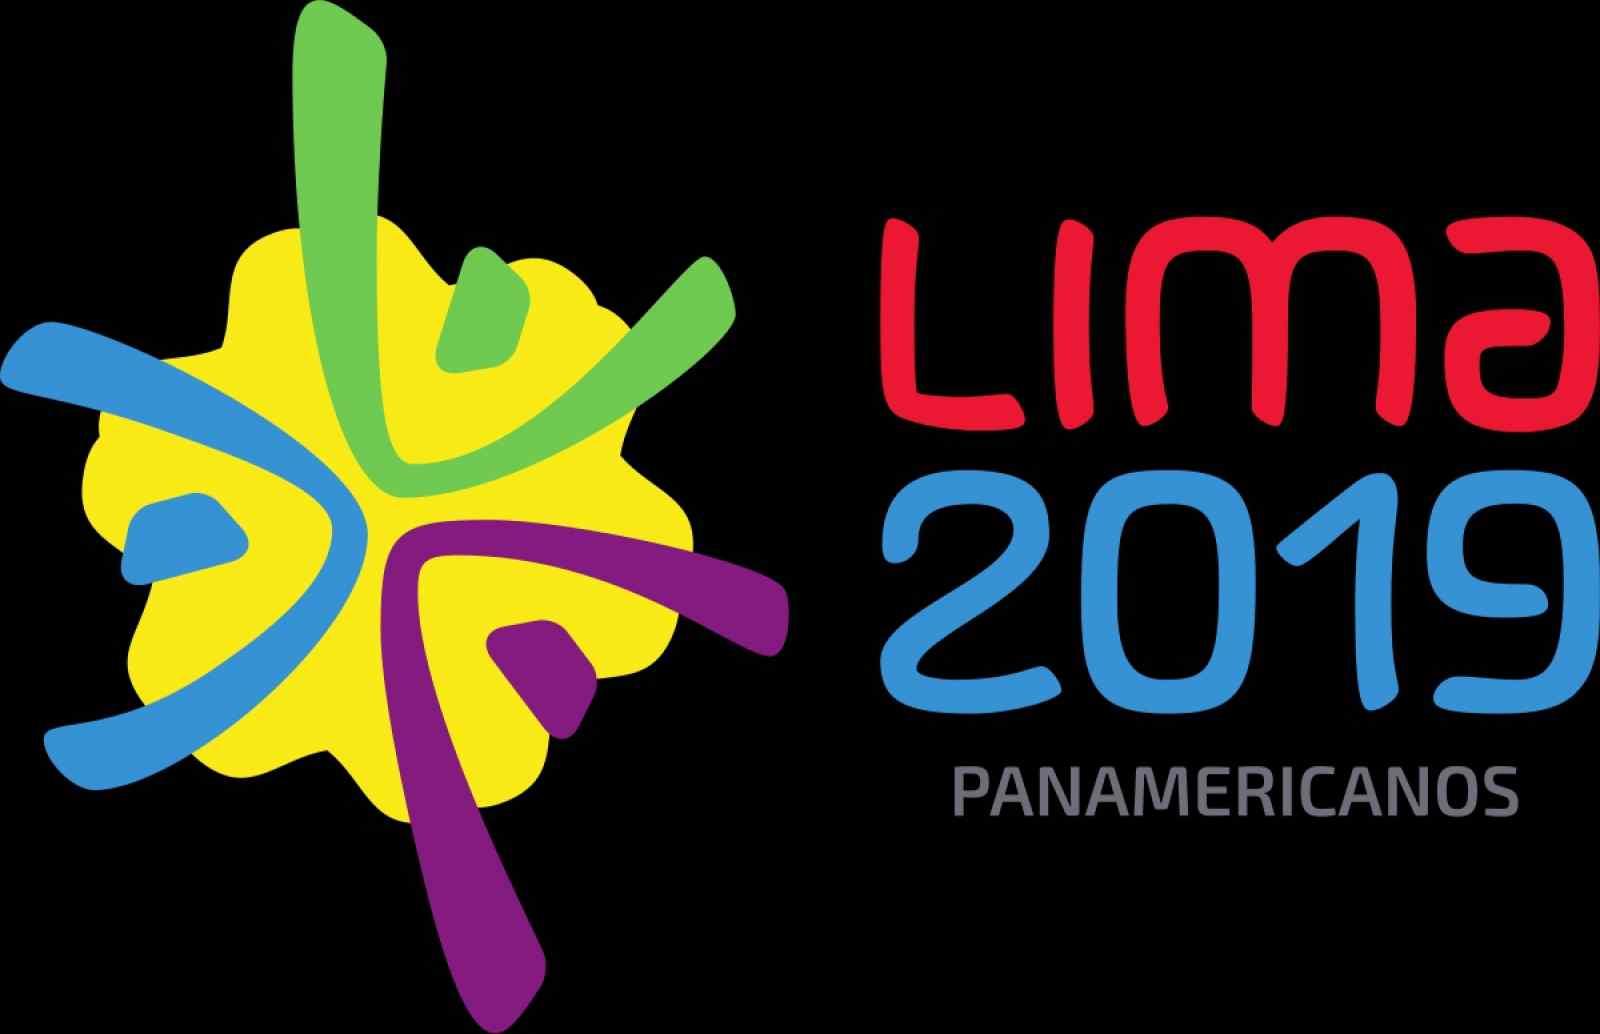 https://timebulletin.com/wp-content/uploads/2019/07/Pan-American-Games-2019.jpg